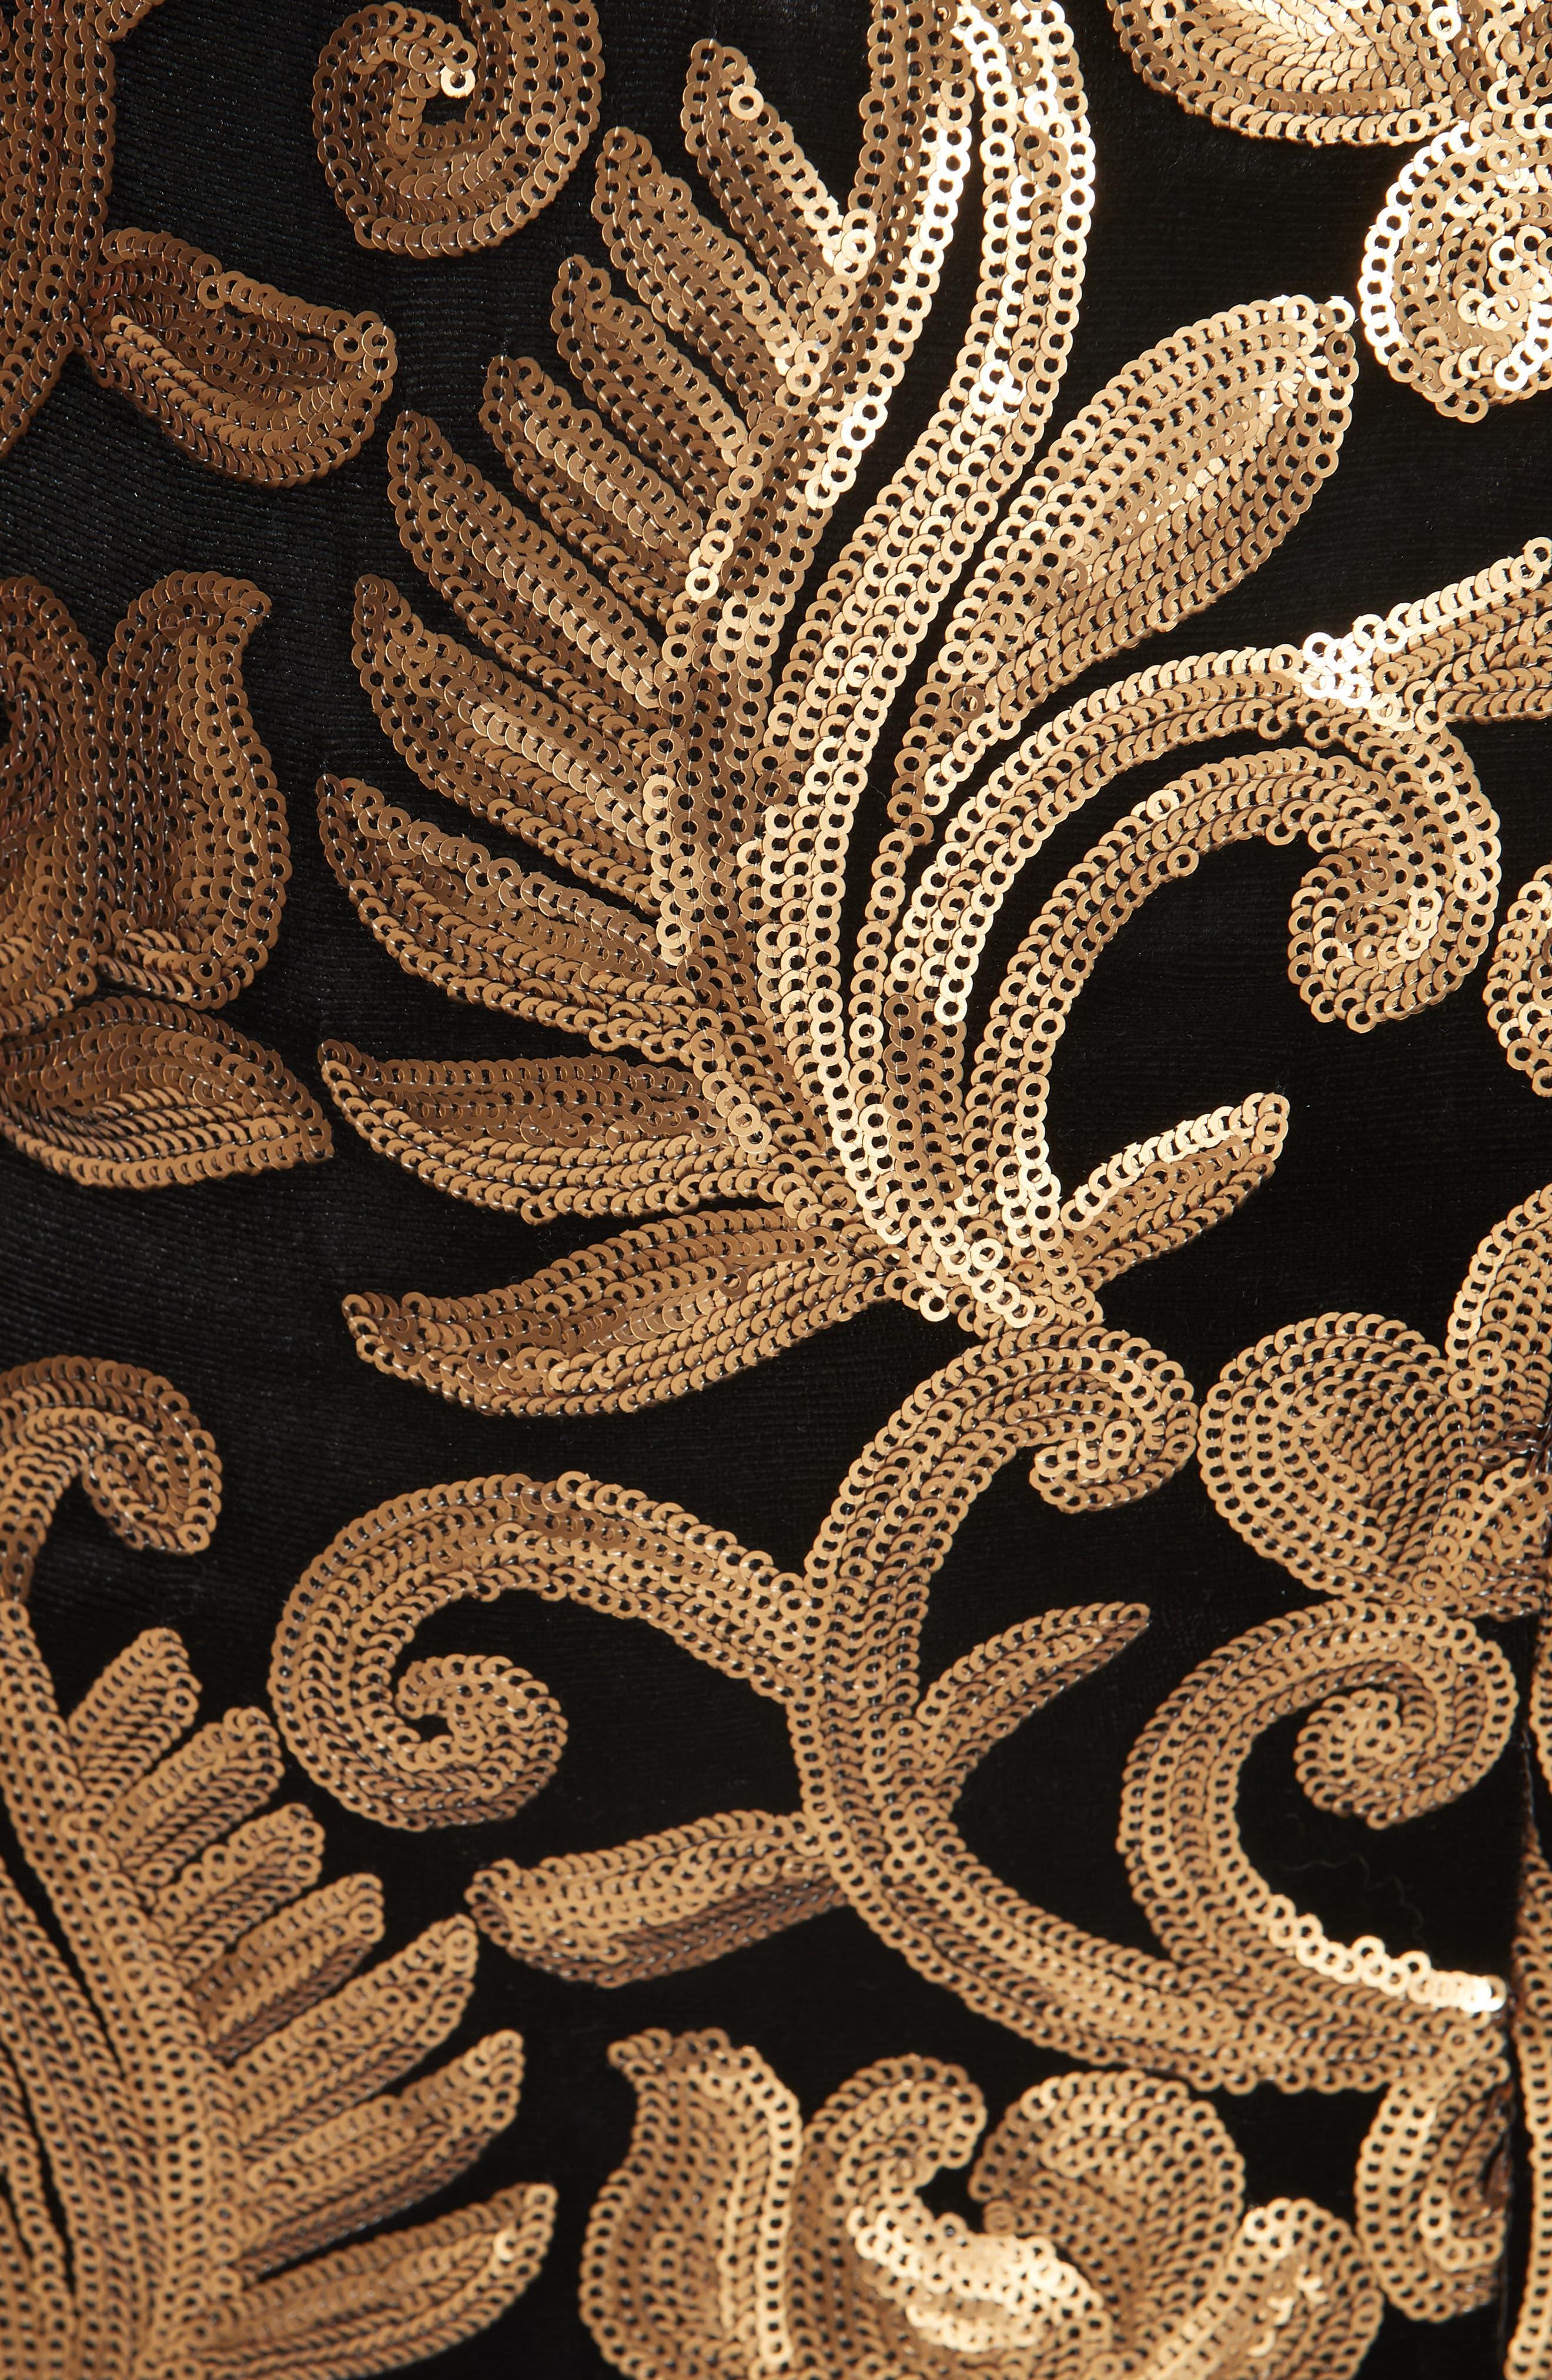 Inka Sequin Flora Dress,                             Alternate thumbnail 6, color,                             001